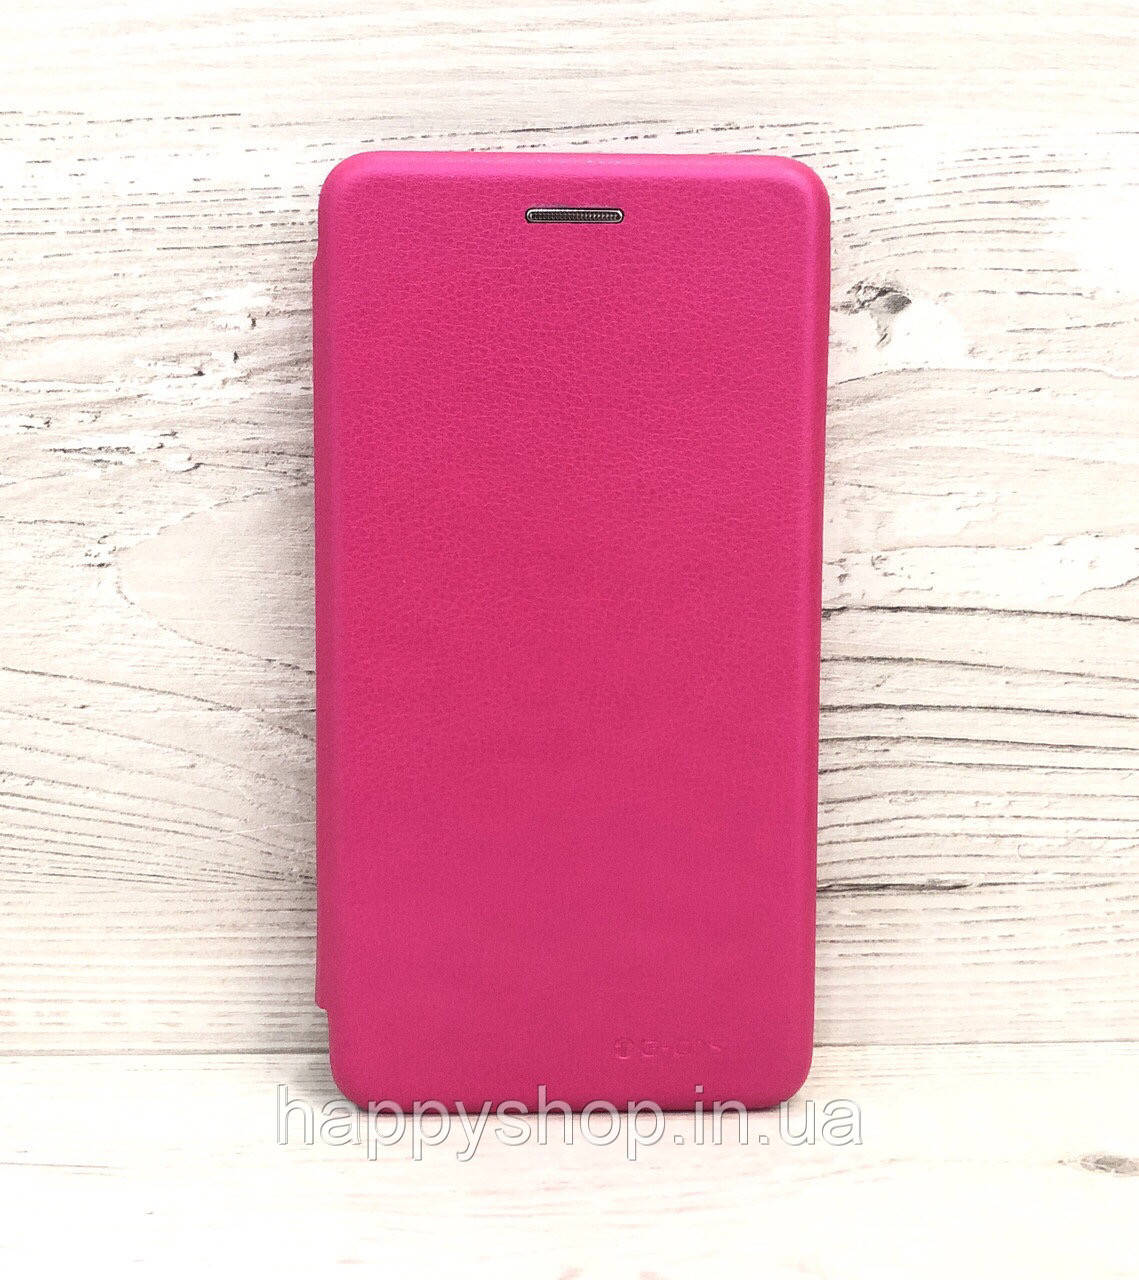 Чохол-книжка G-Case для Huawei Y6 Prime 2018 (ATU-L31) Рожевий